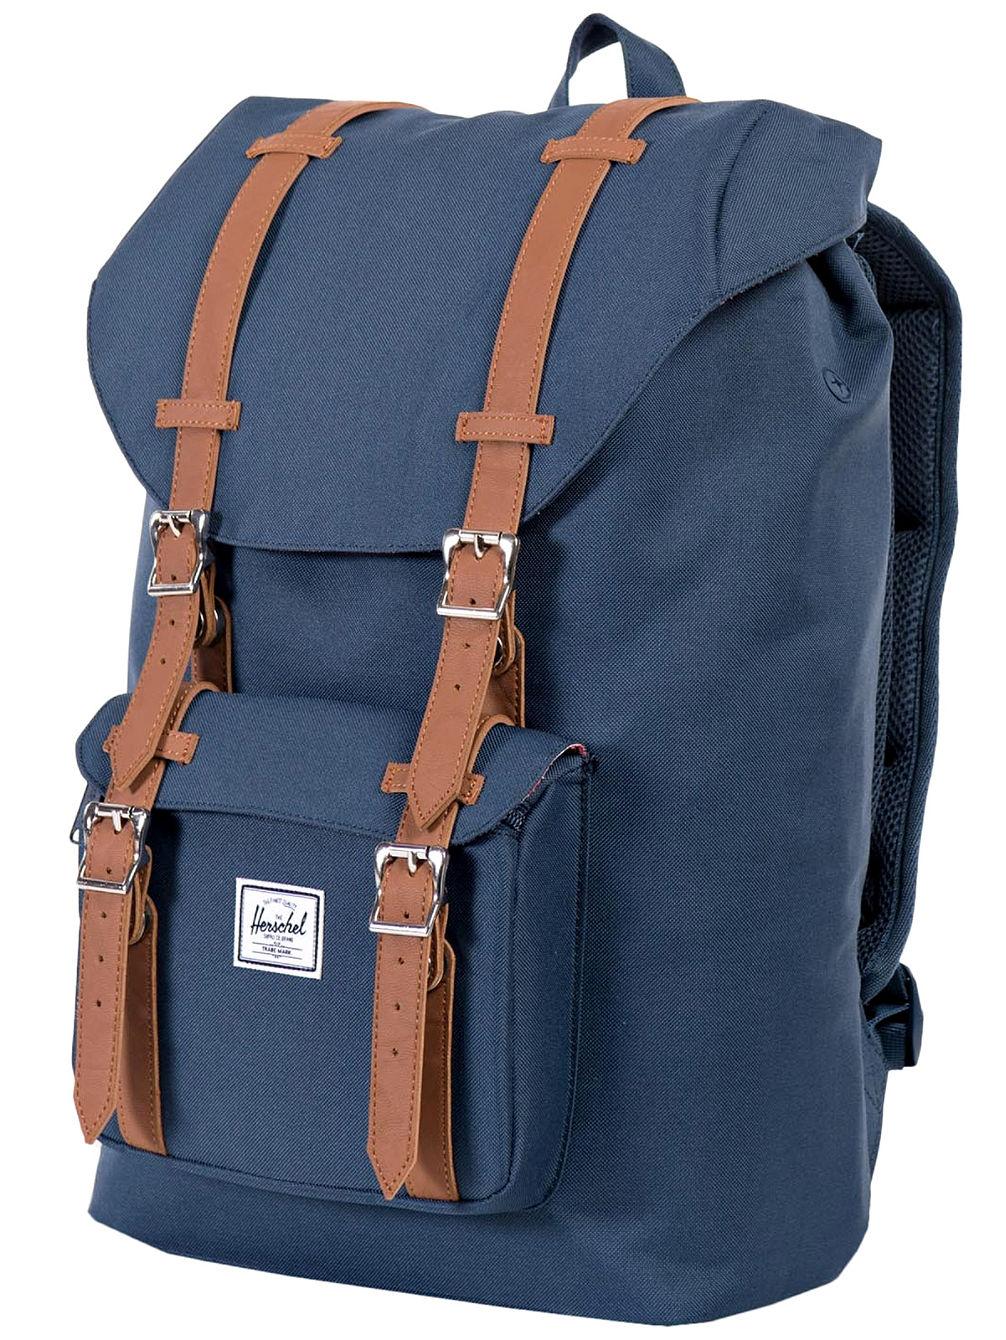 10c556bcb5 Buy Herschel Little America Mid-Volume Backpack Backpack online at  blue-tomato.com